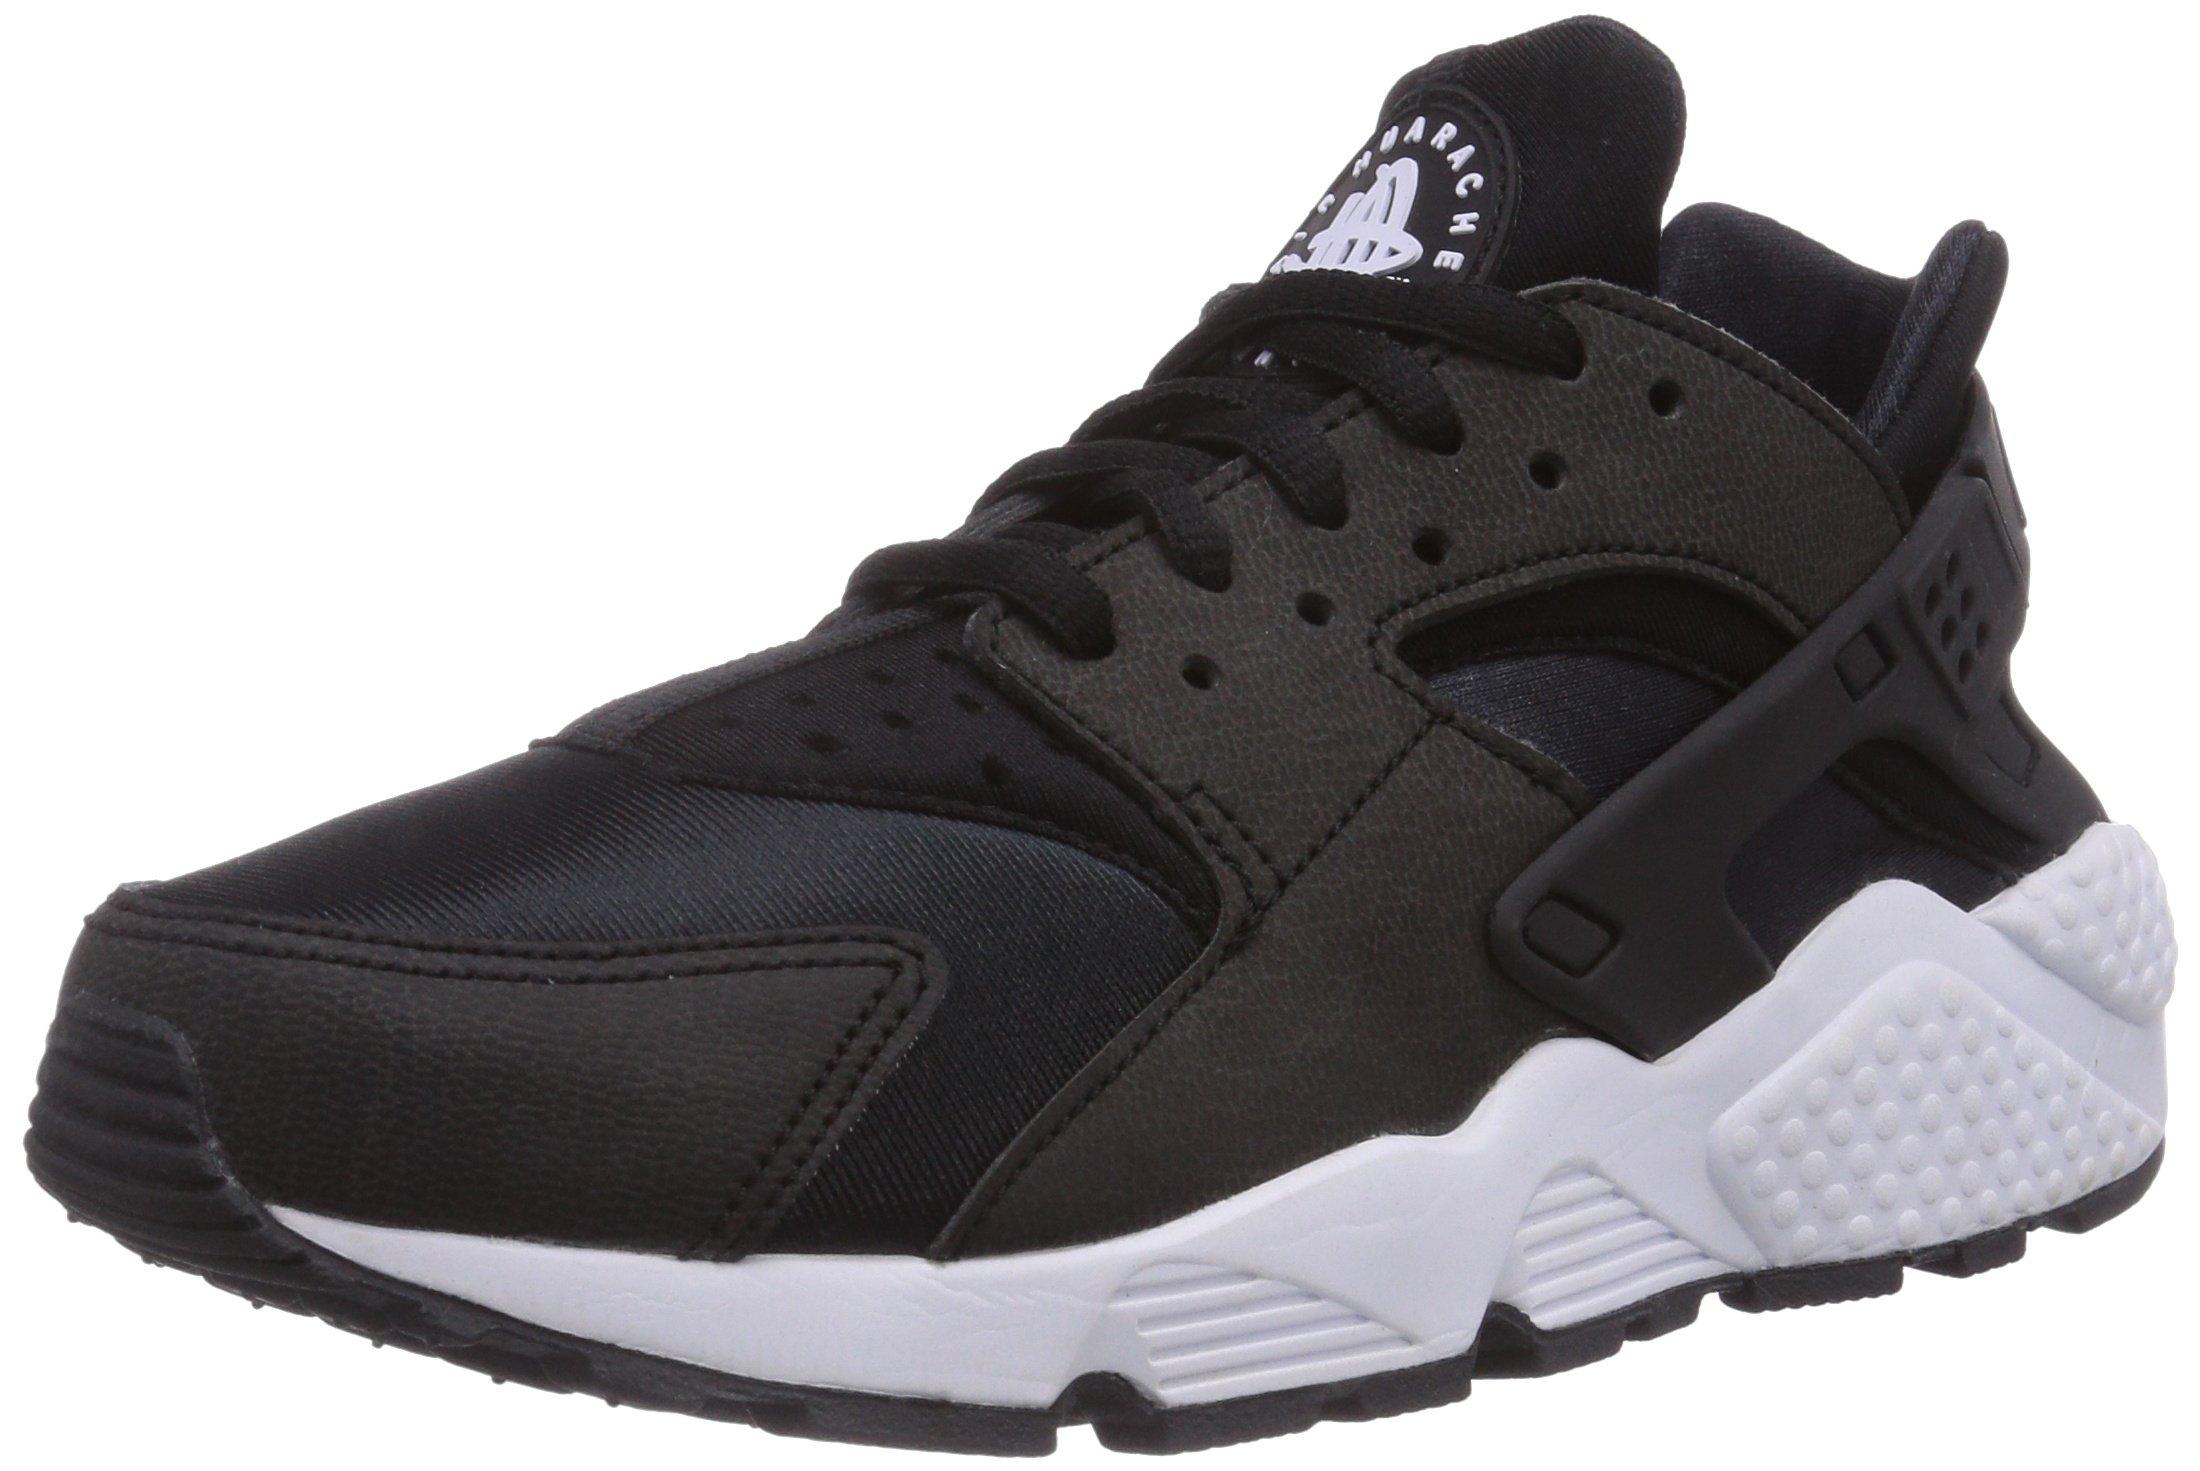 Nike Women's Air Huarache Run Black/Black-White Ankle-High Running Shoe - 9M